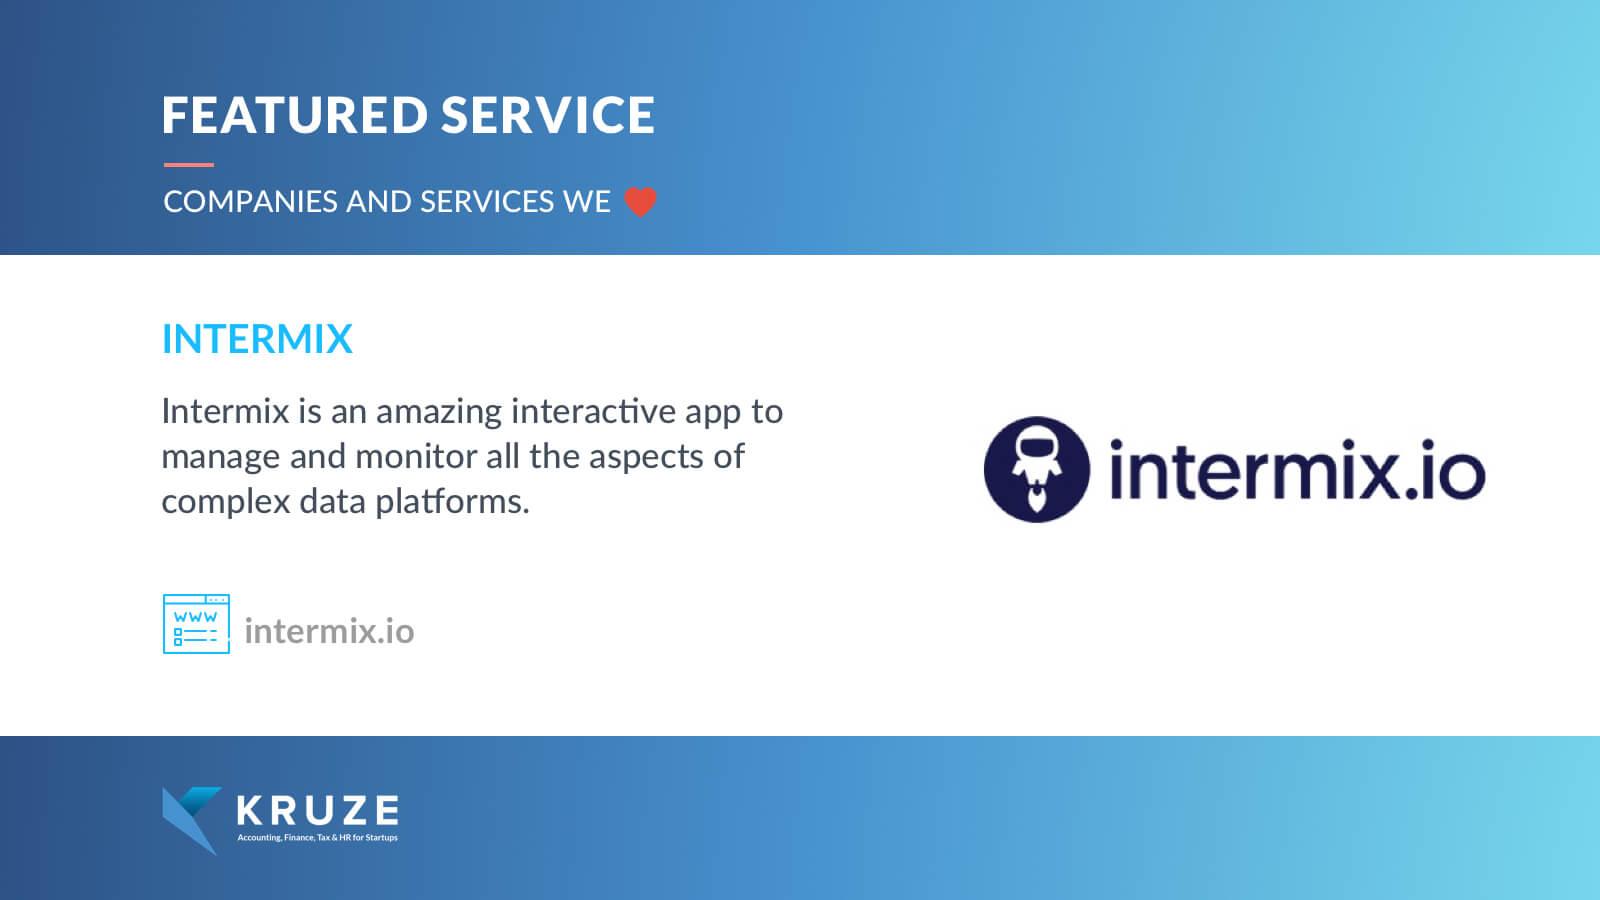 Featured Service - Intermix